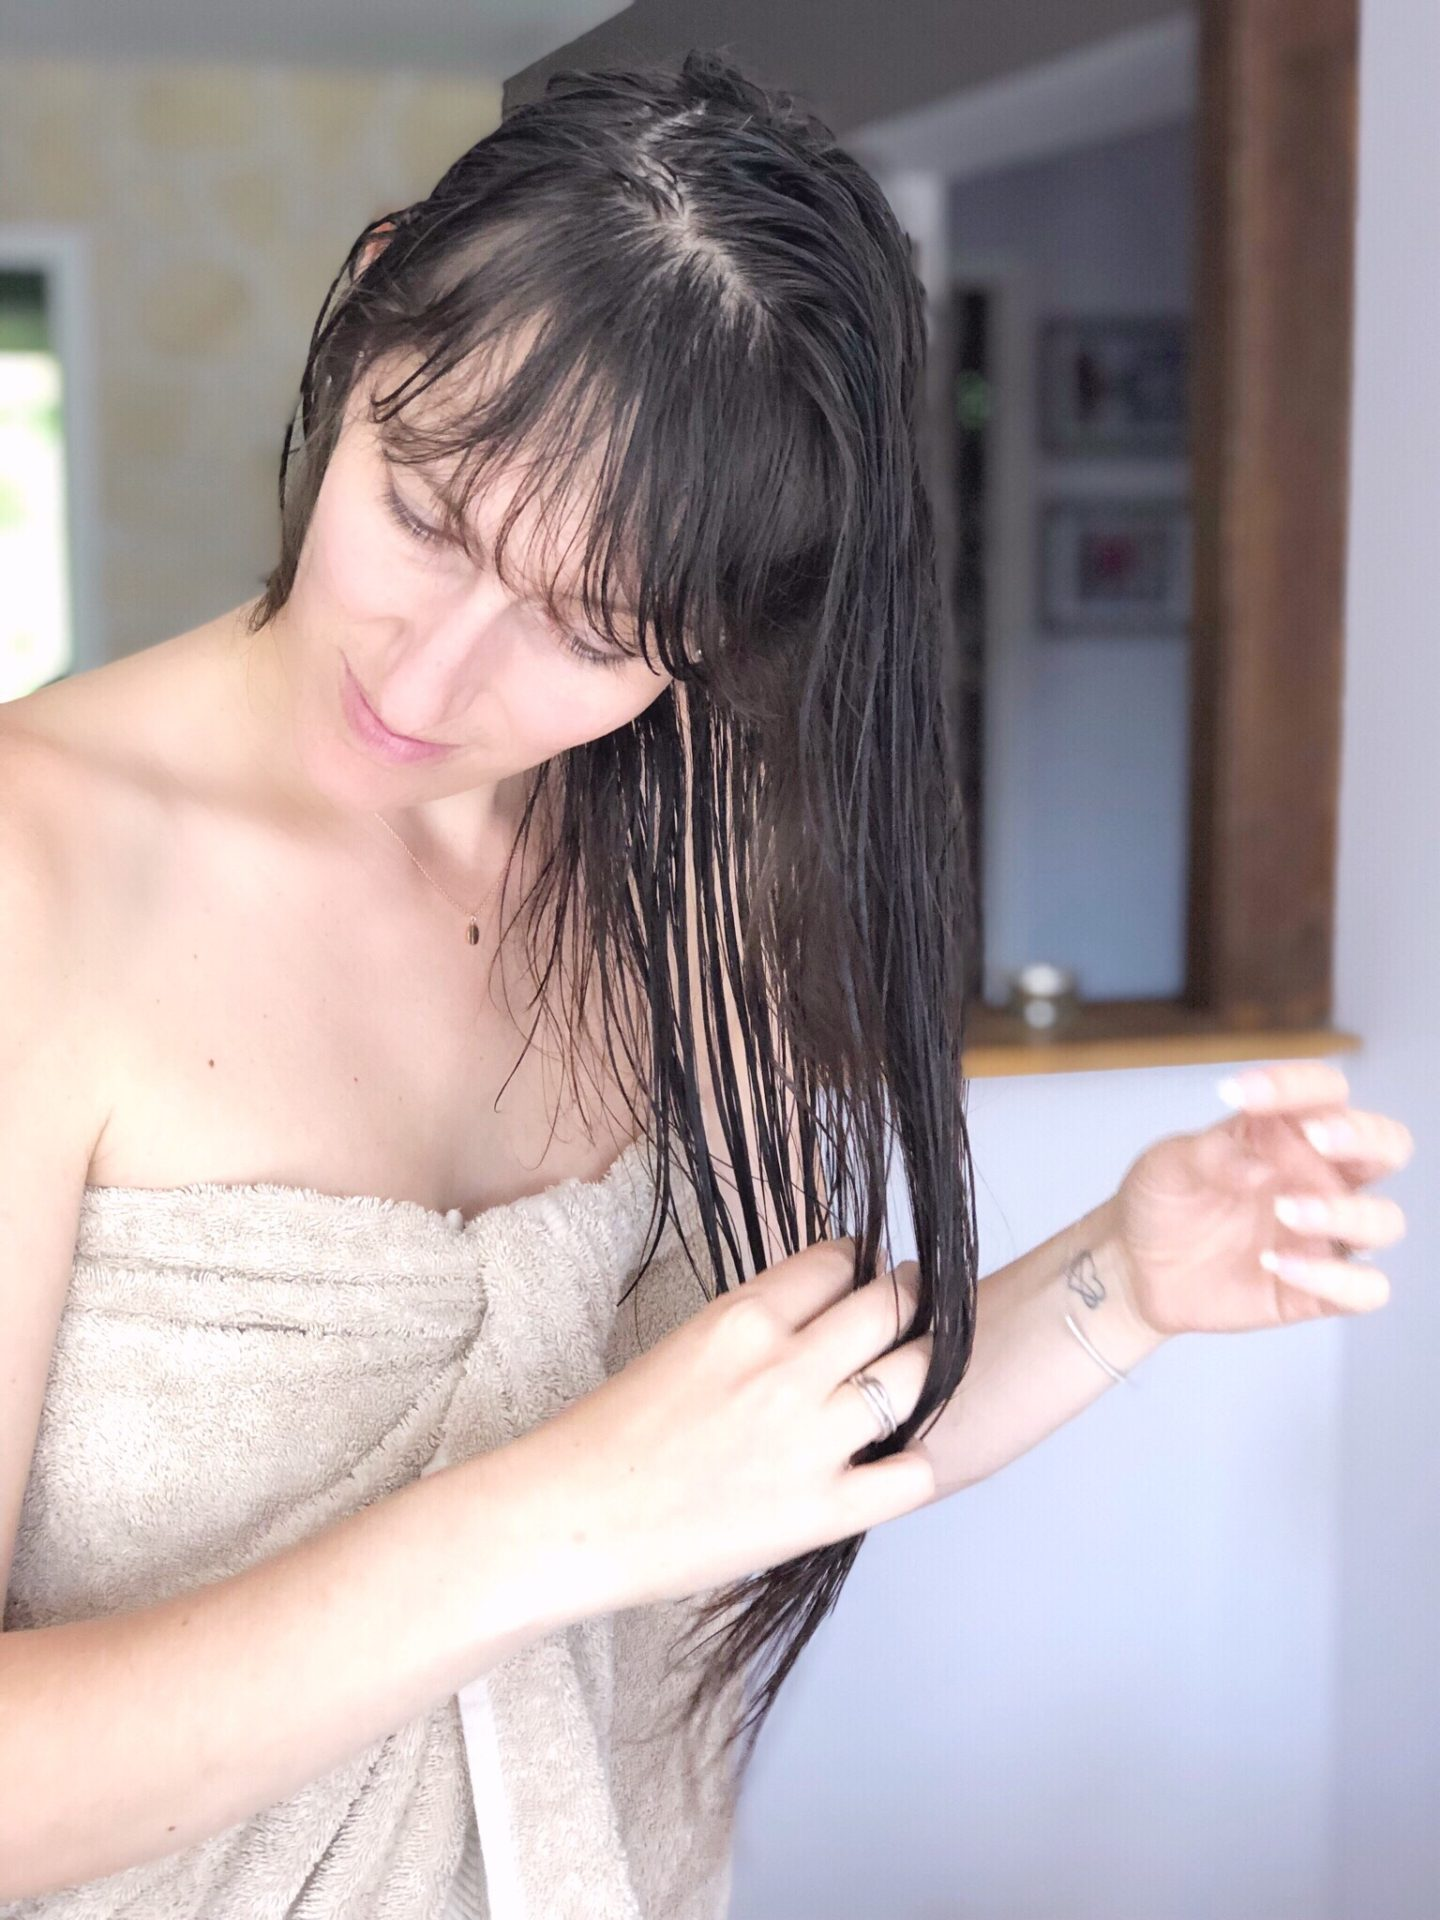 J'ai testé la routine cheveux MayBeauty